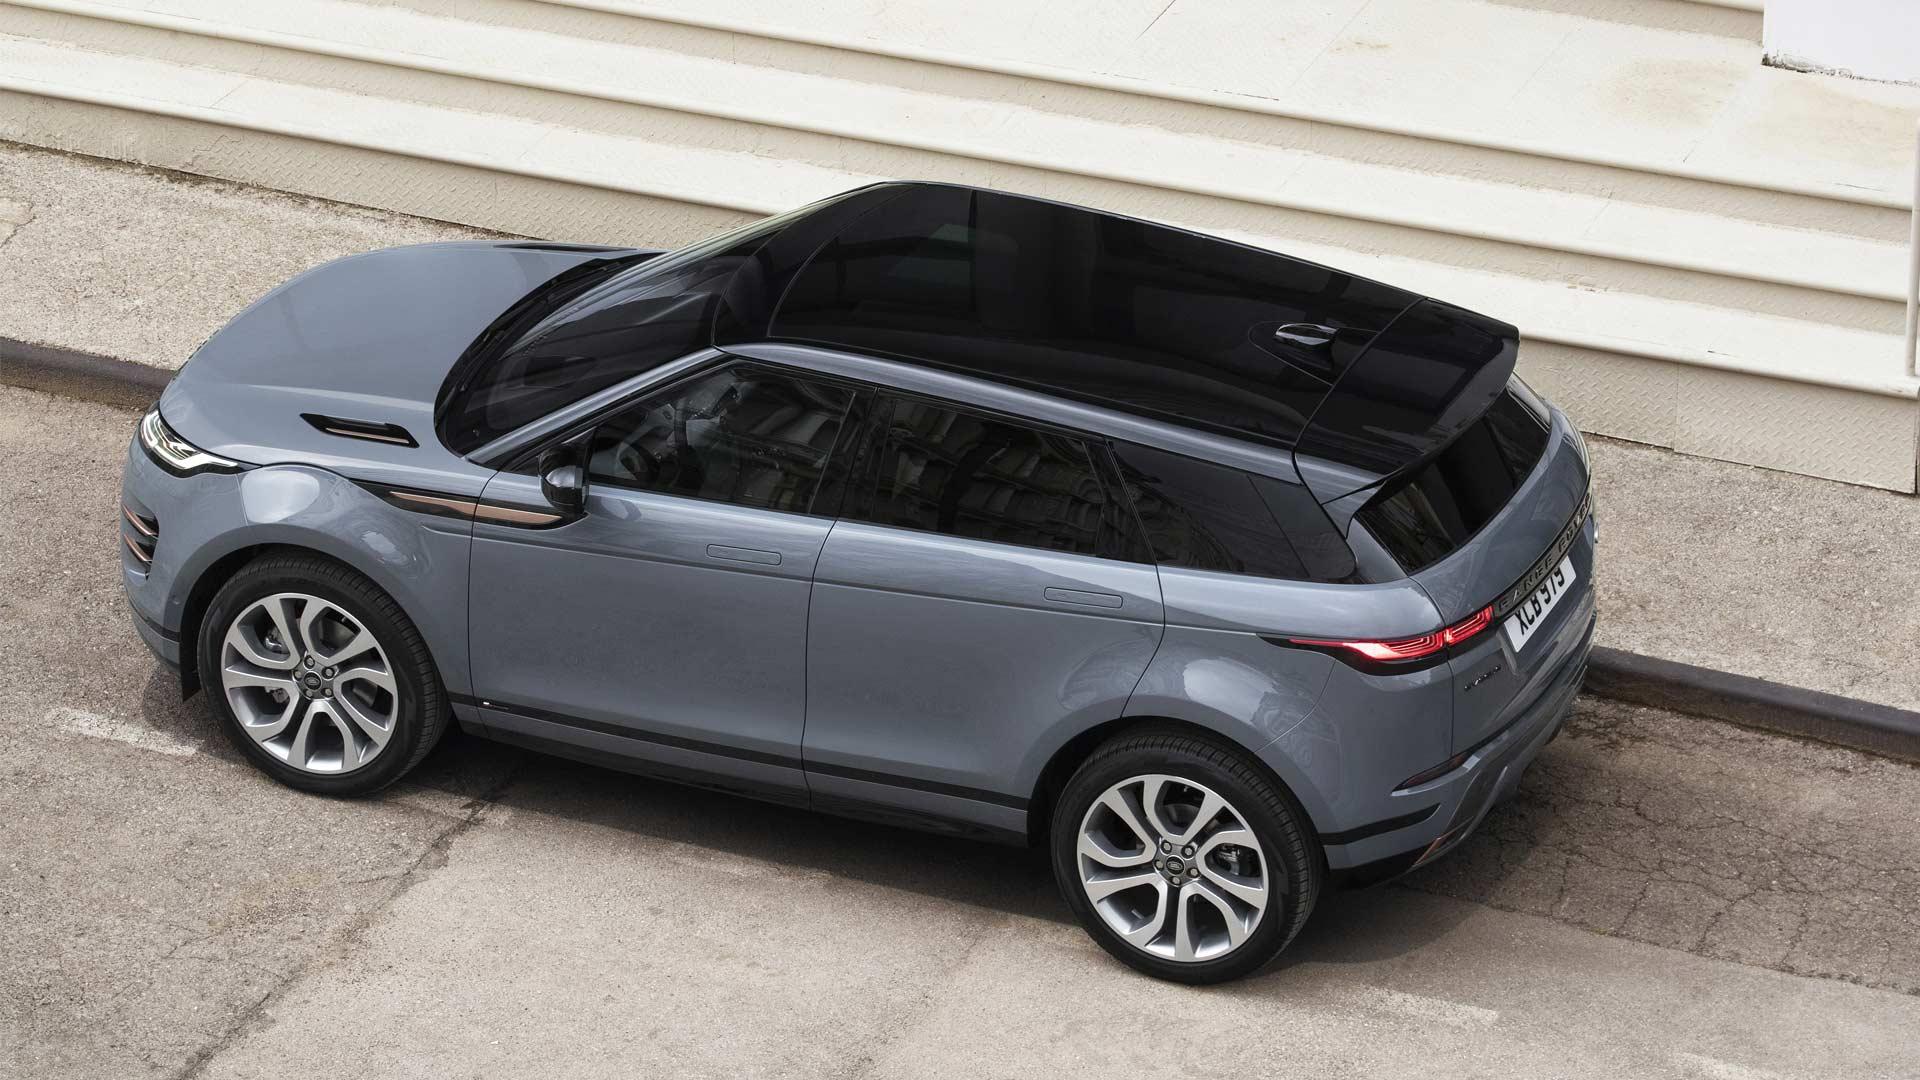 2020-Range-Rover-Evoque_4